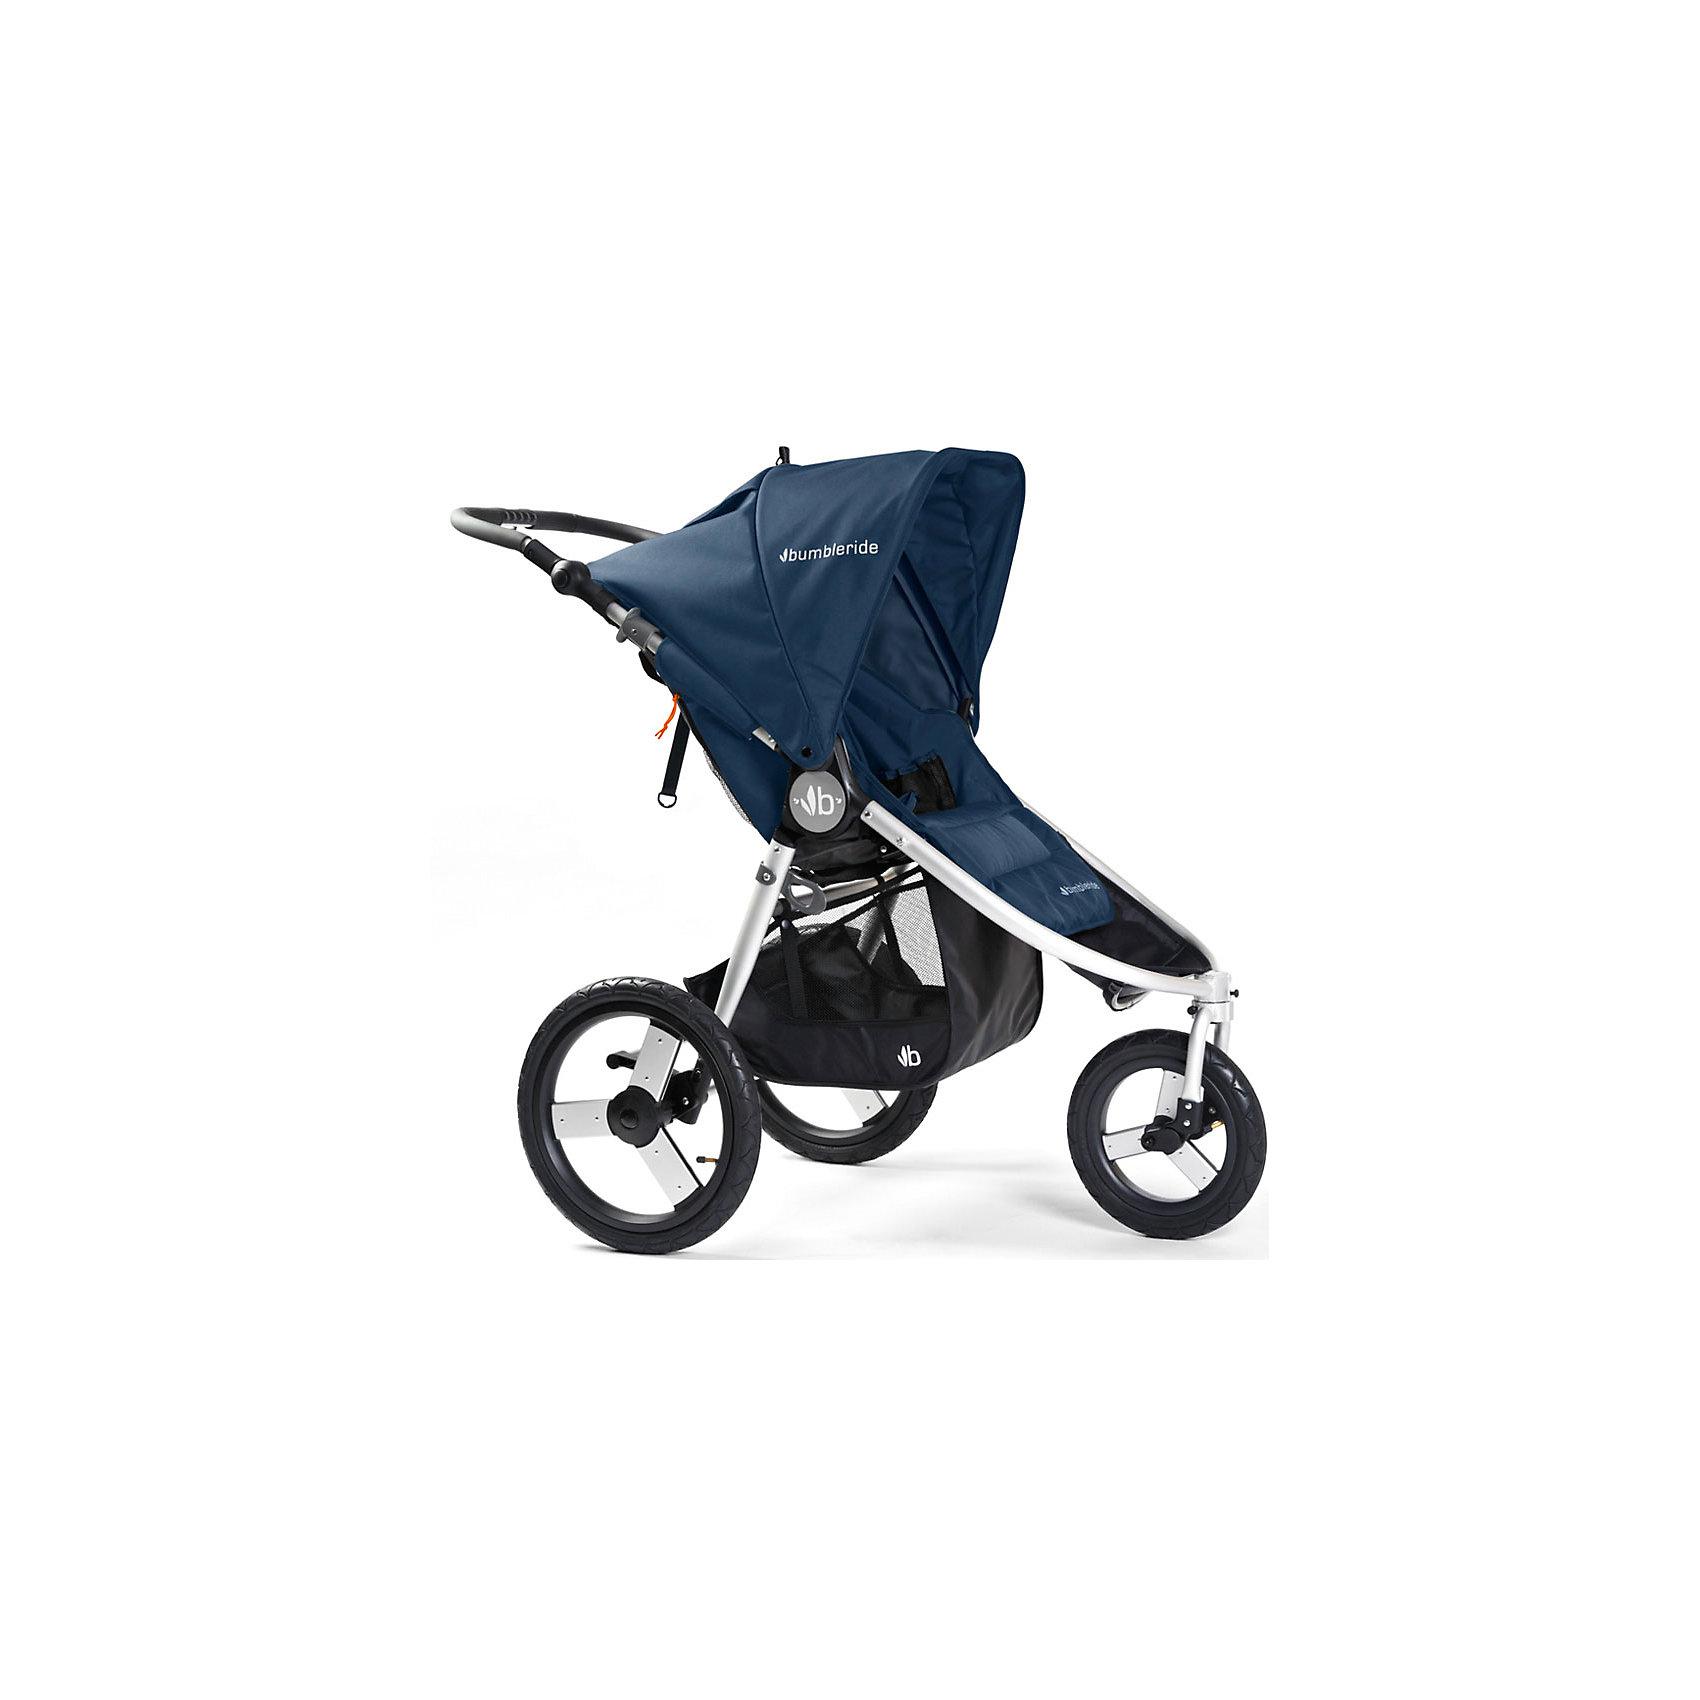 Bumbleride Прогулочная коляска Speed, Bumbleride , maritime blue